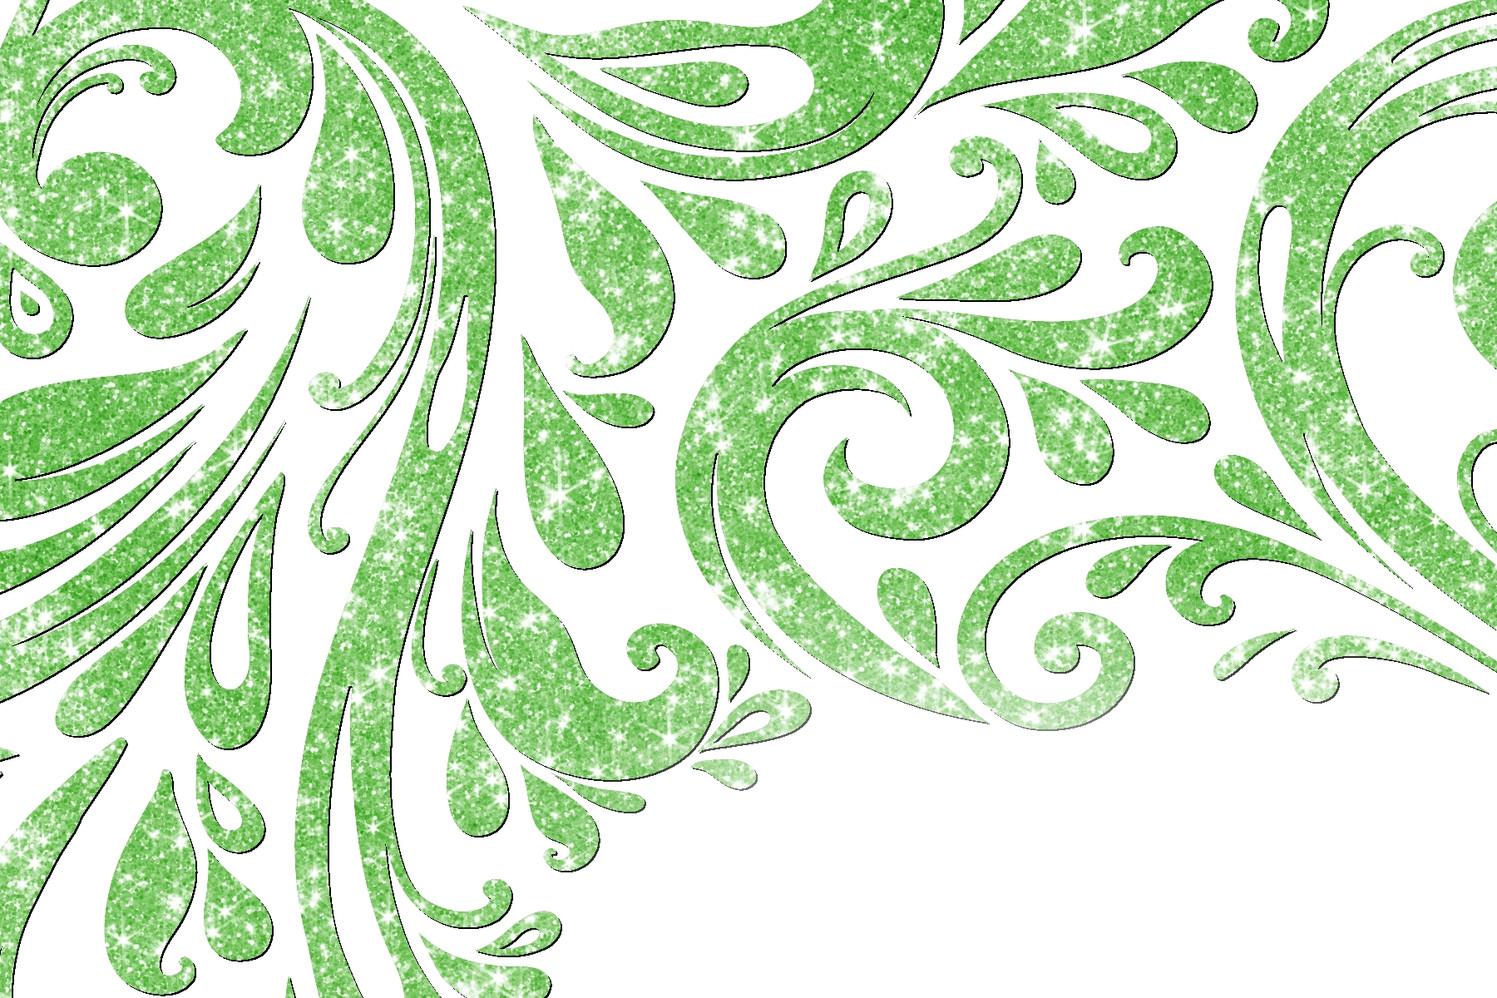 Vert scintillant